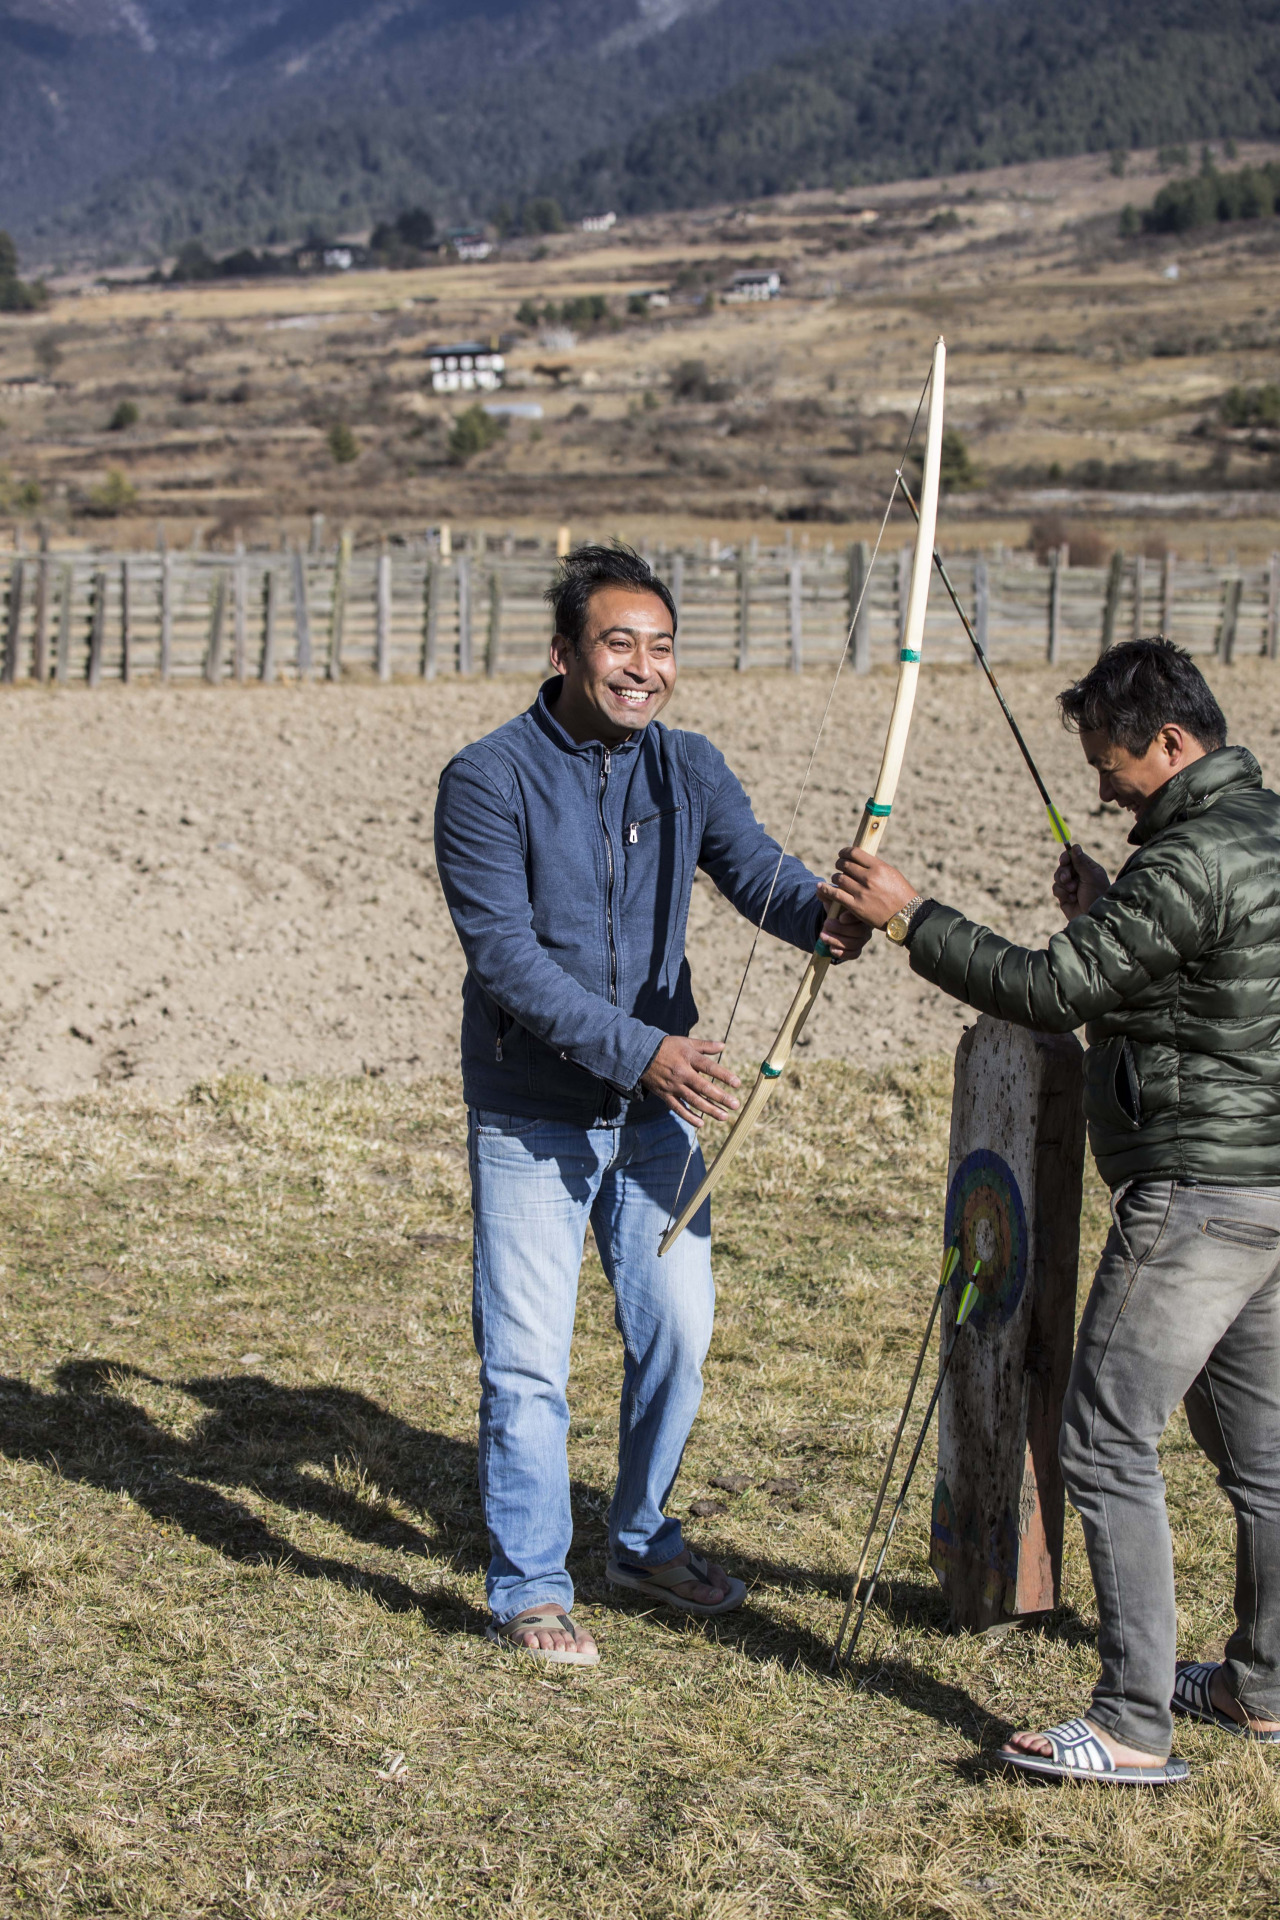 National sport: Archery